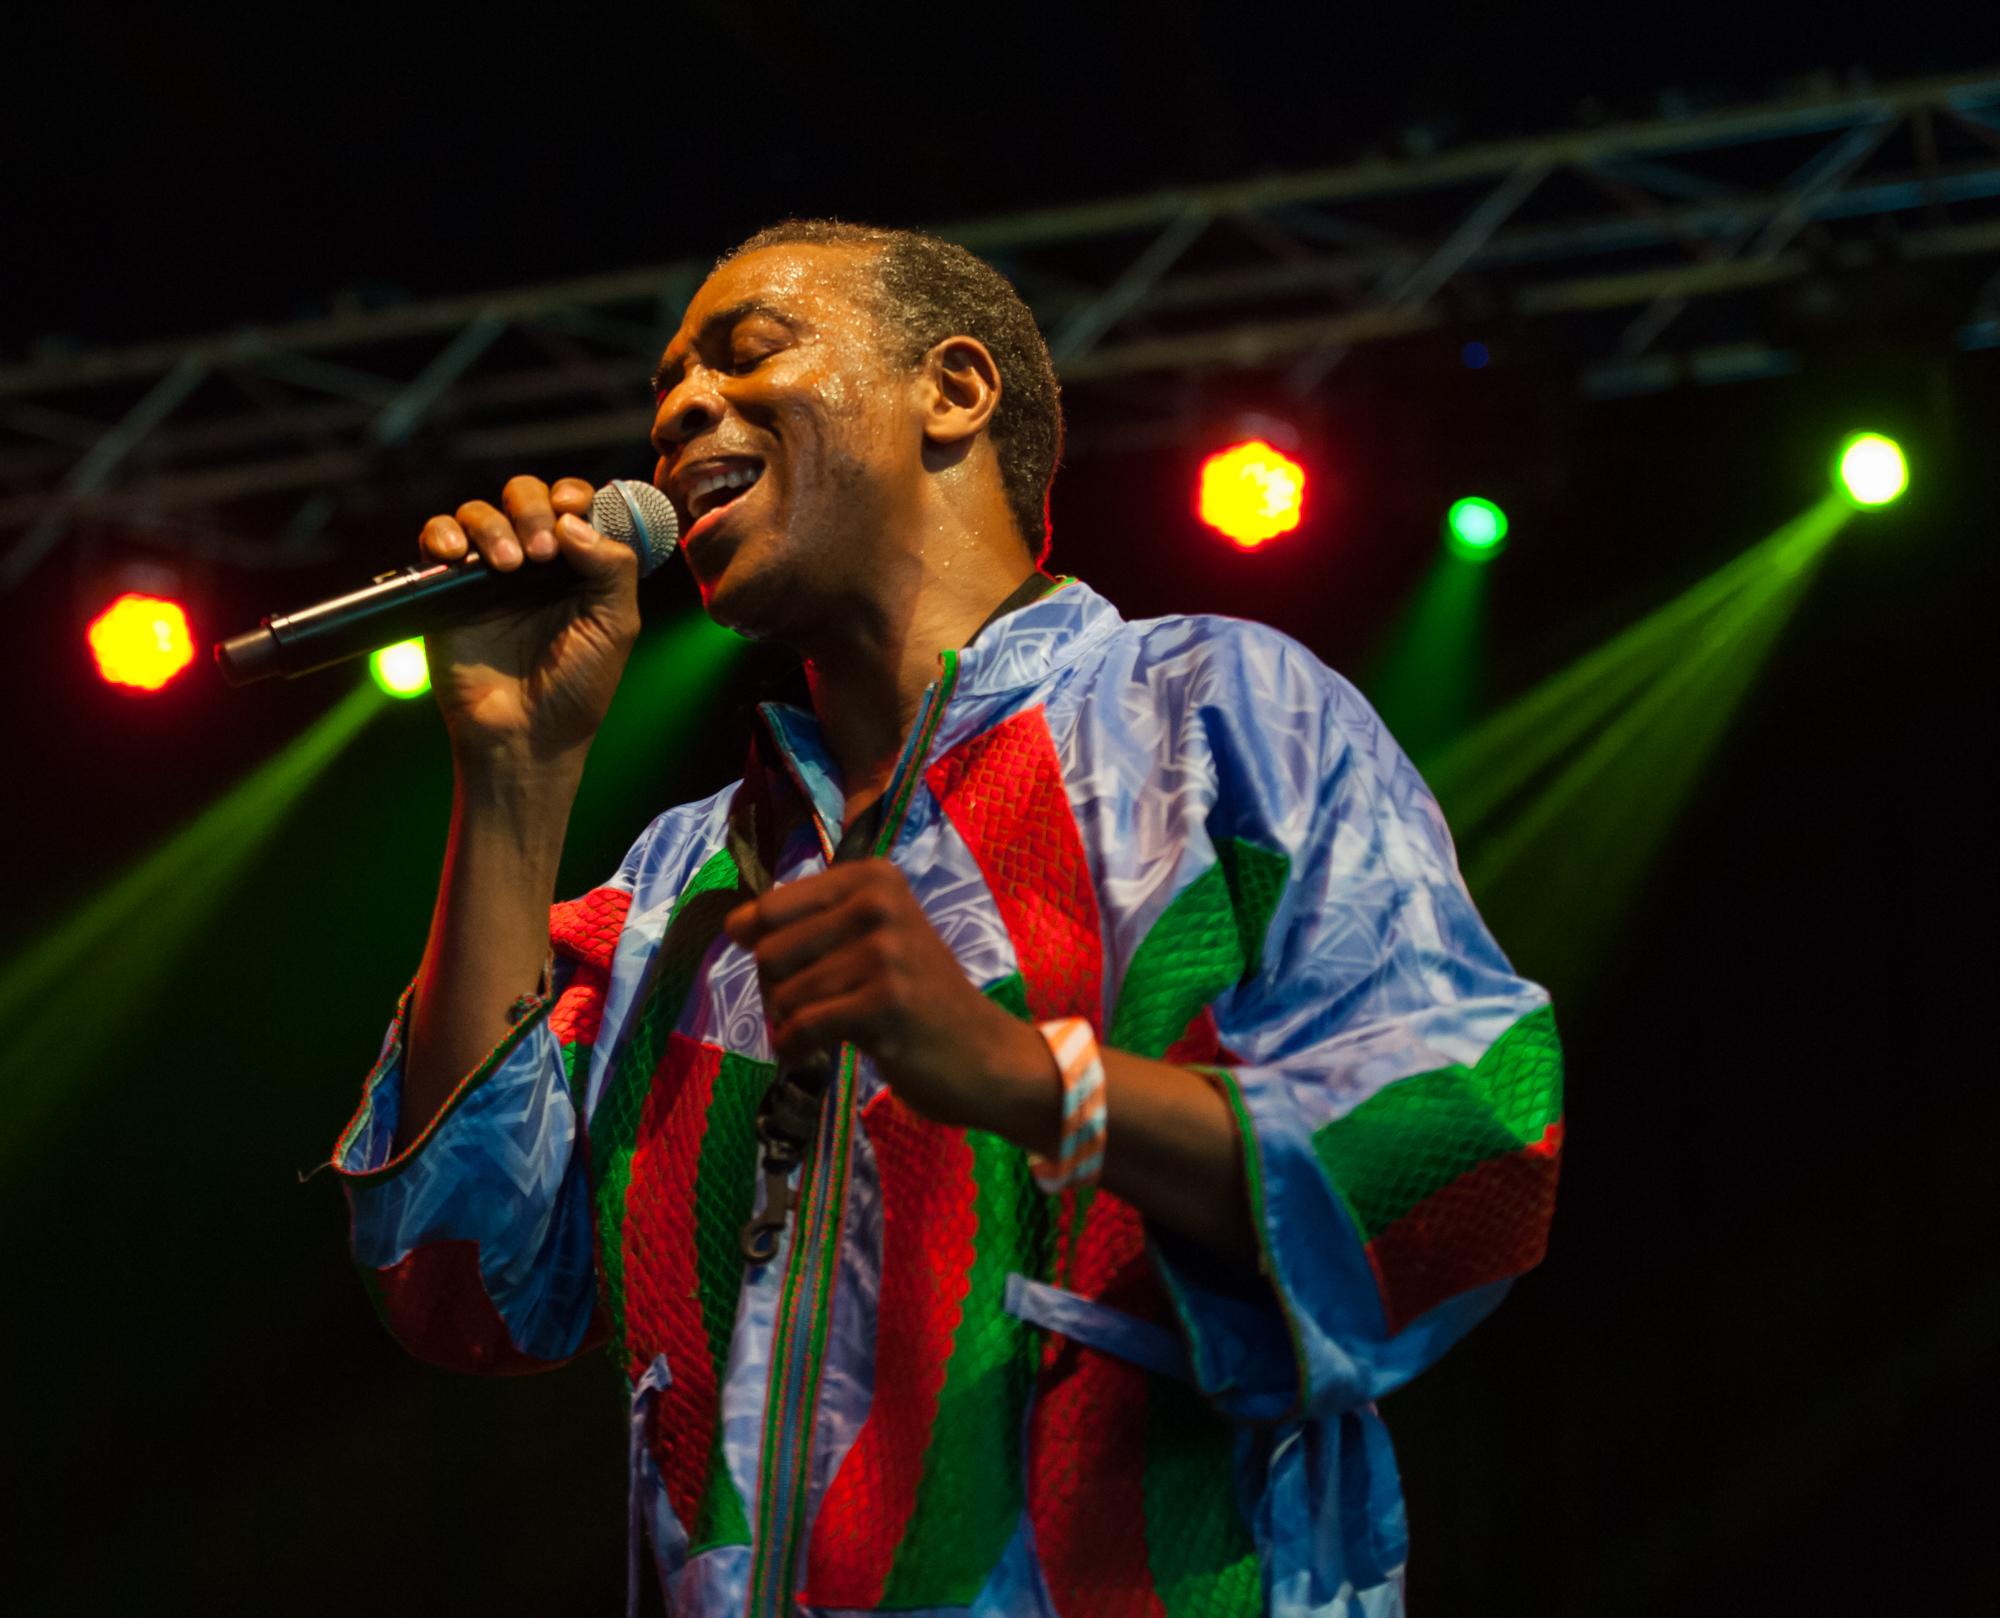 London, UK. 19th July 2015. Femi Kuti performing at Walthamstow Garden Party 2015.